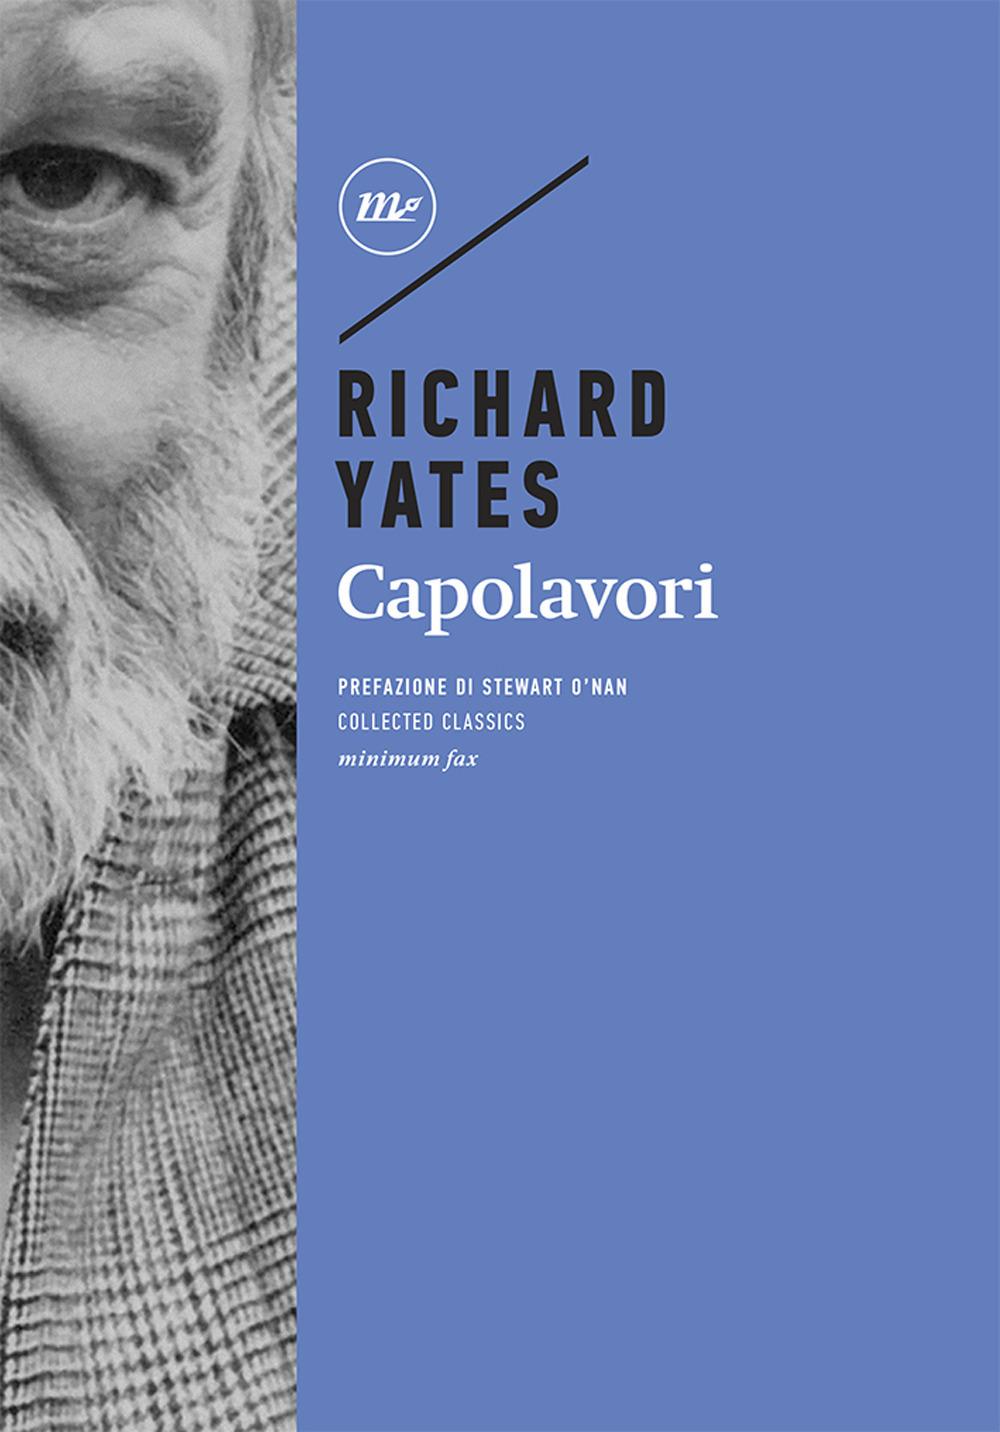 CAPOLAVORI - Yates Richard - 9788833891910